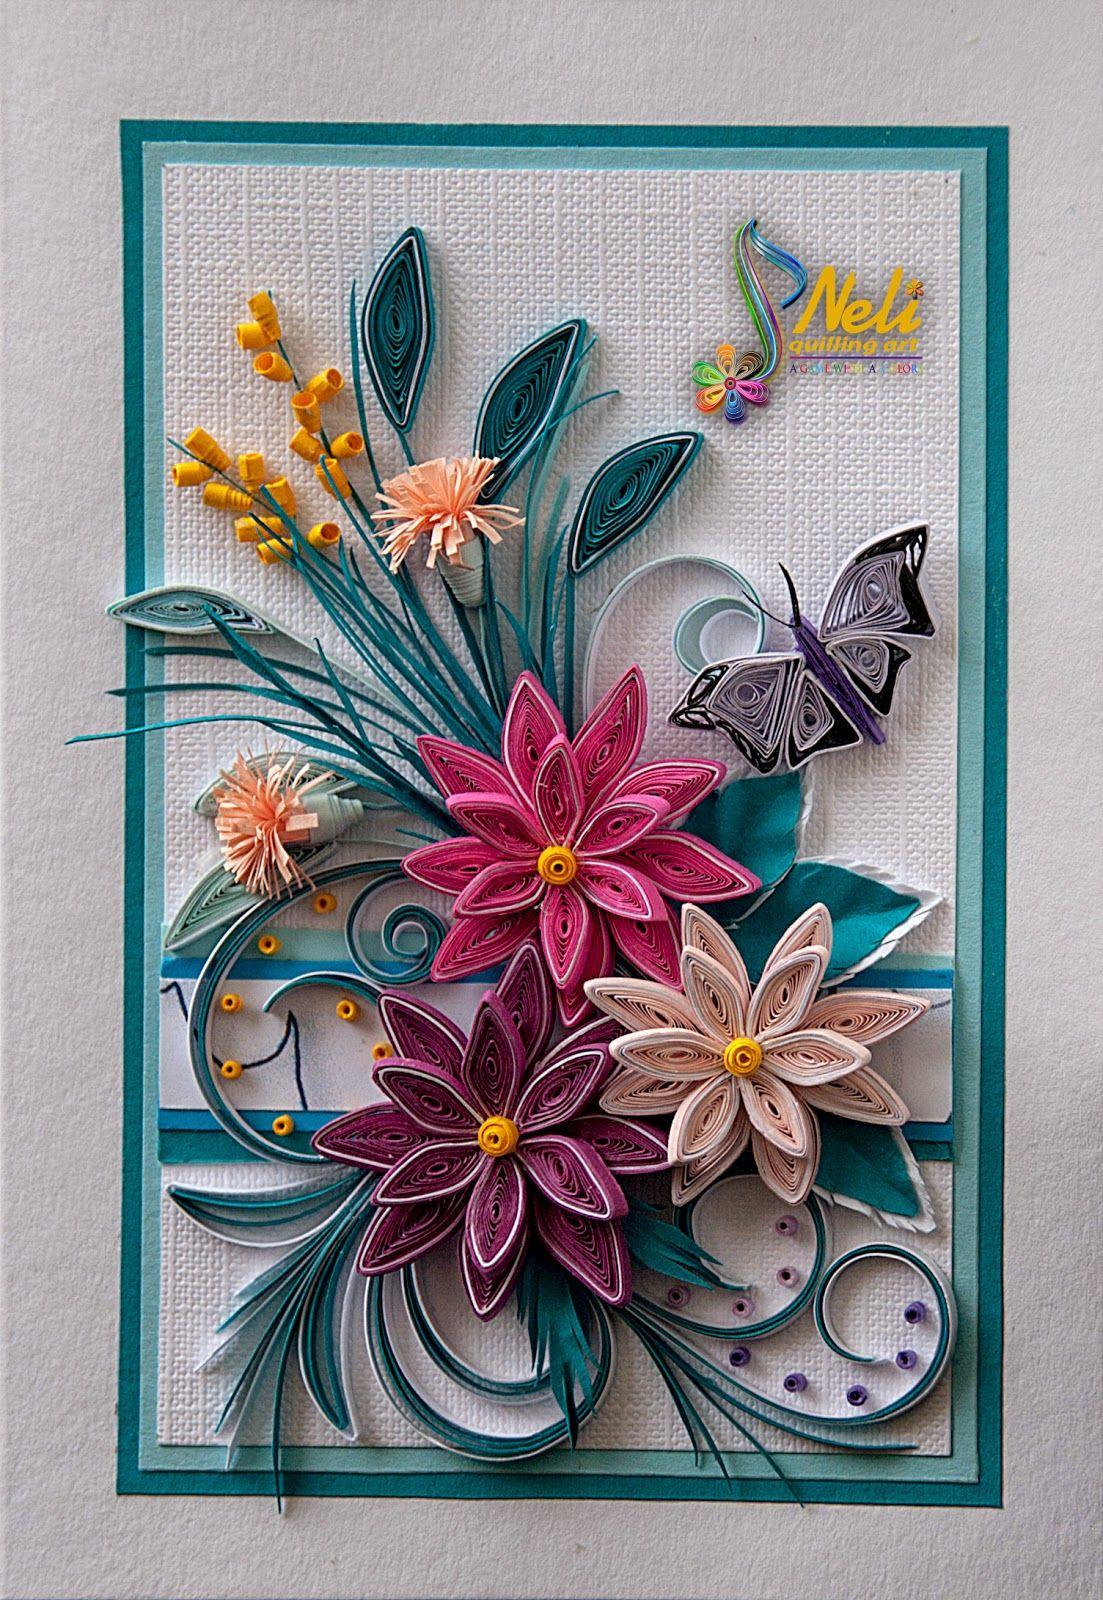 neli quilling art quilling card 14 8 cm 10 5 cm paper works pinterest papier. Black Bedroom Furniture Sets. Home Design Ideas